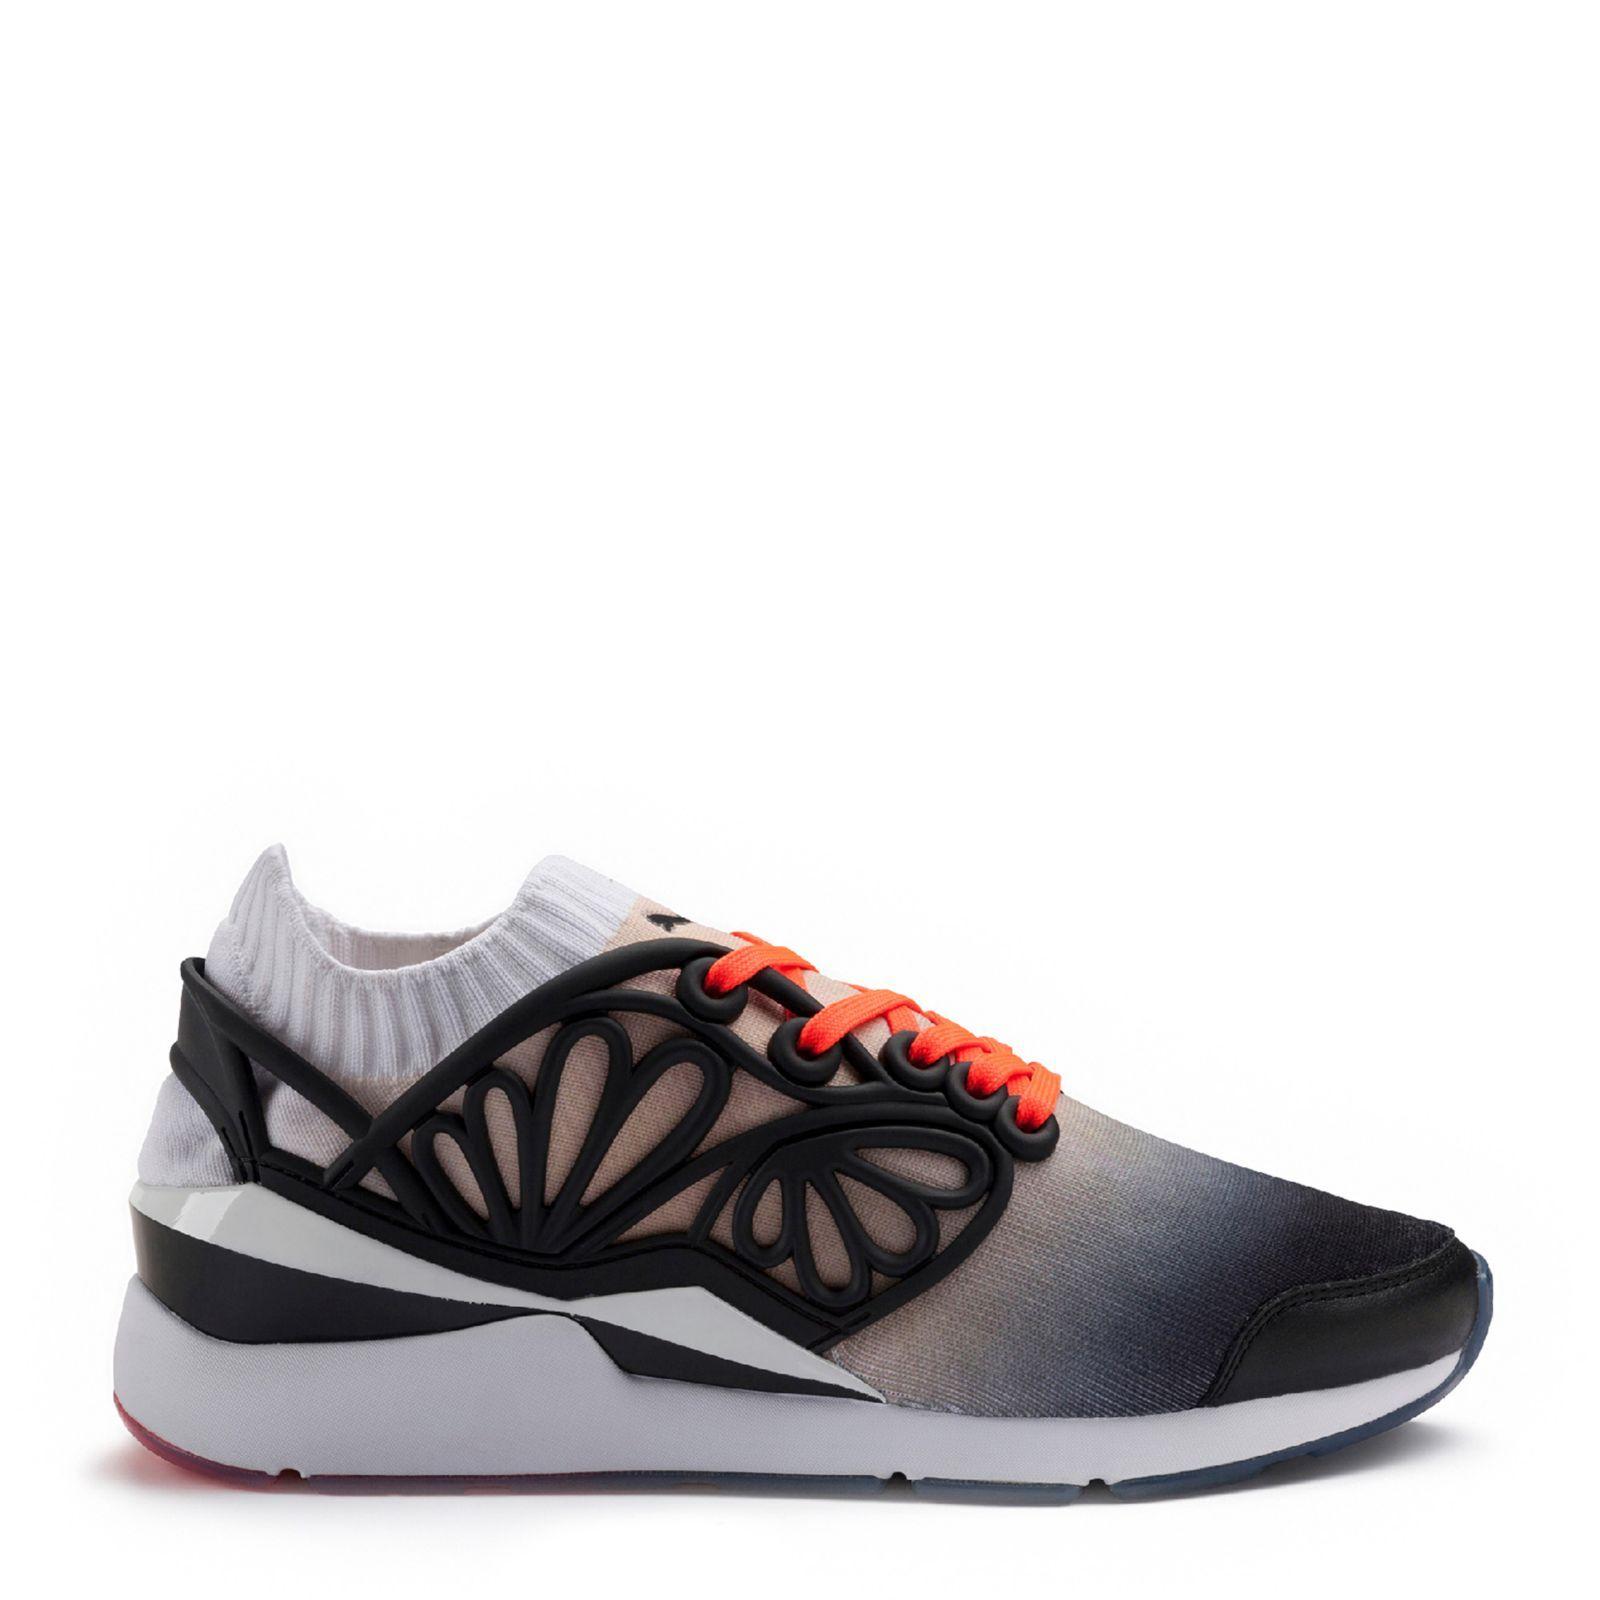 SneakersShoe Pearl Sophia Puma X Webster Cage Nvm8n0w